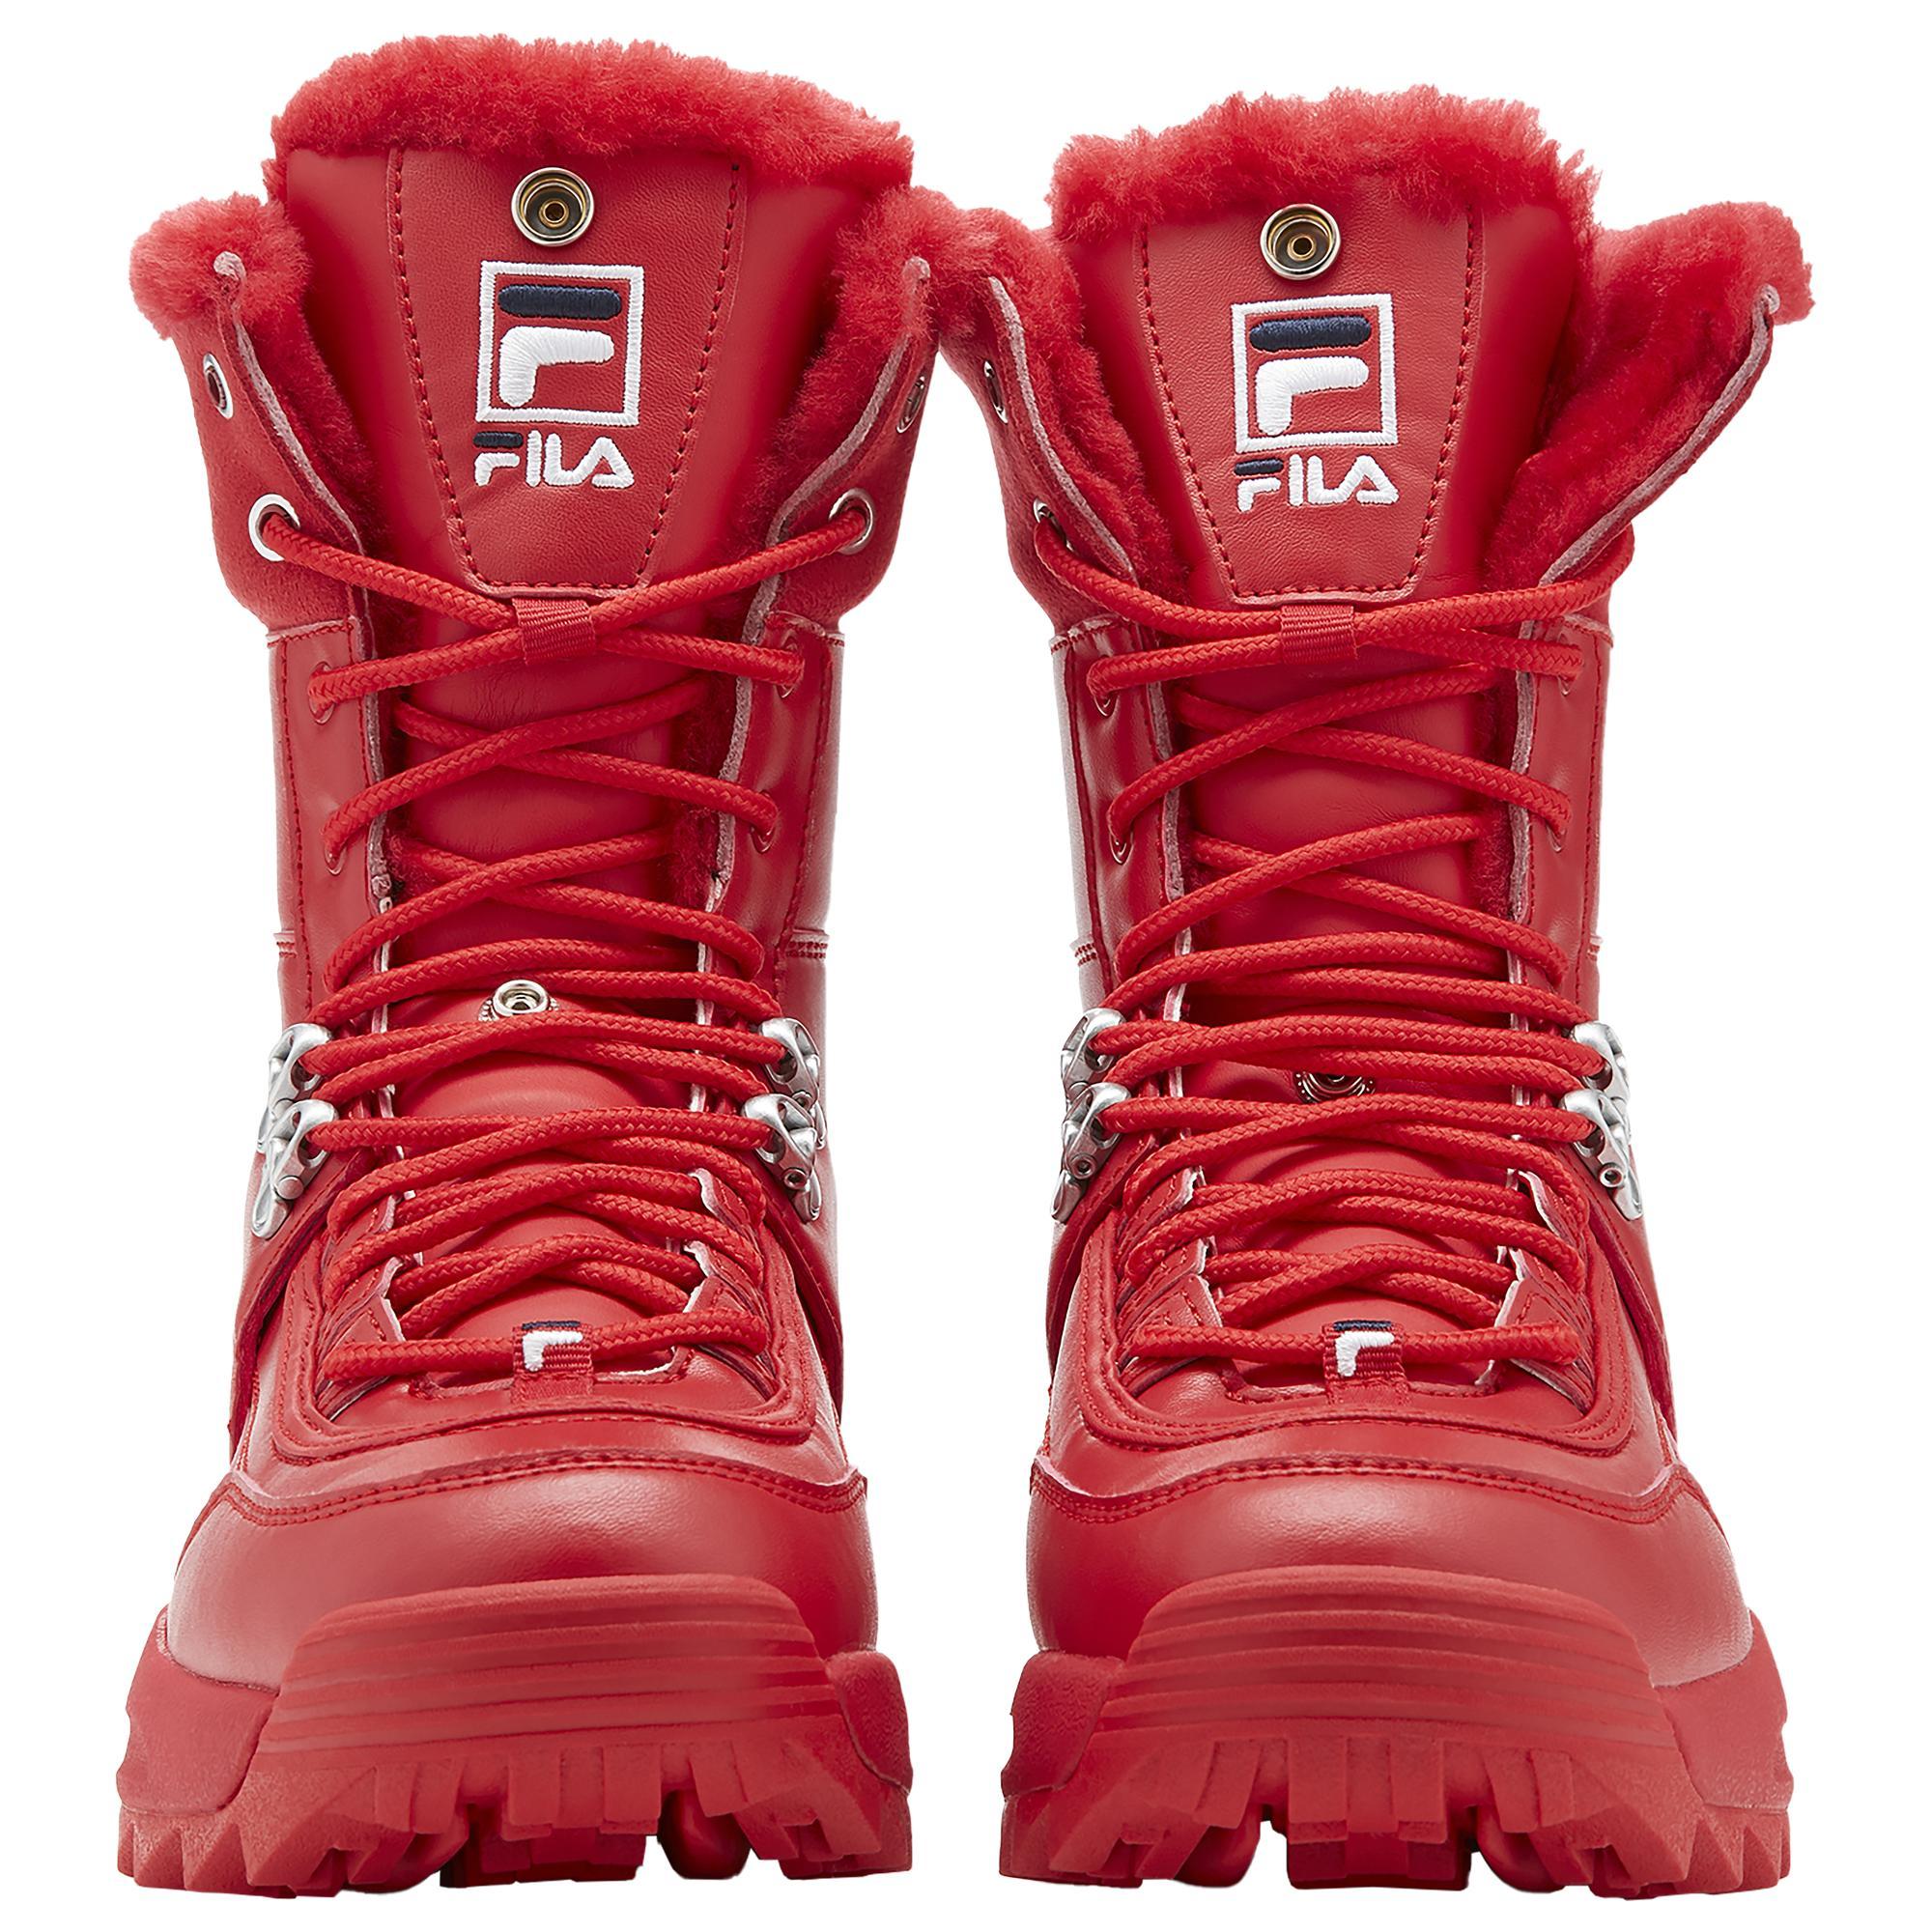 Fila Leather Disruptor Boot Ii - Shoes